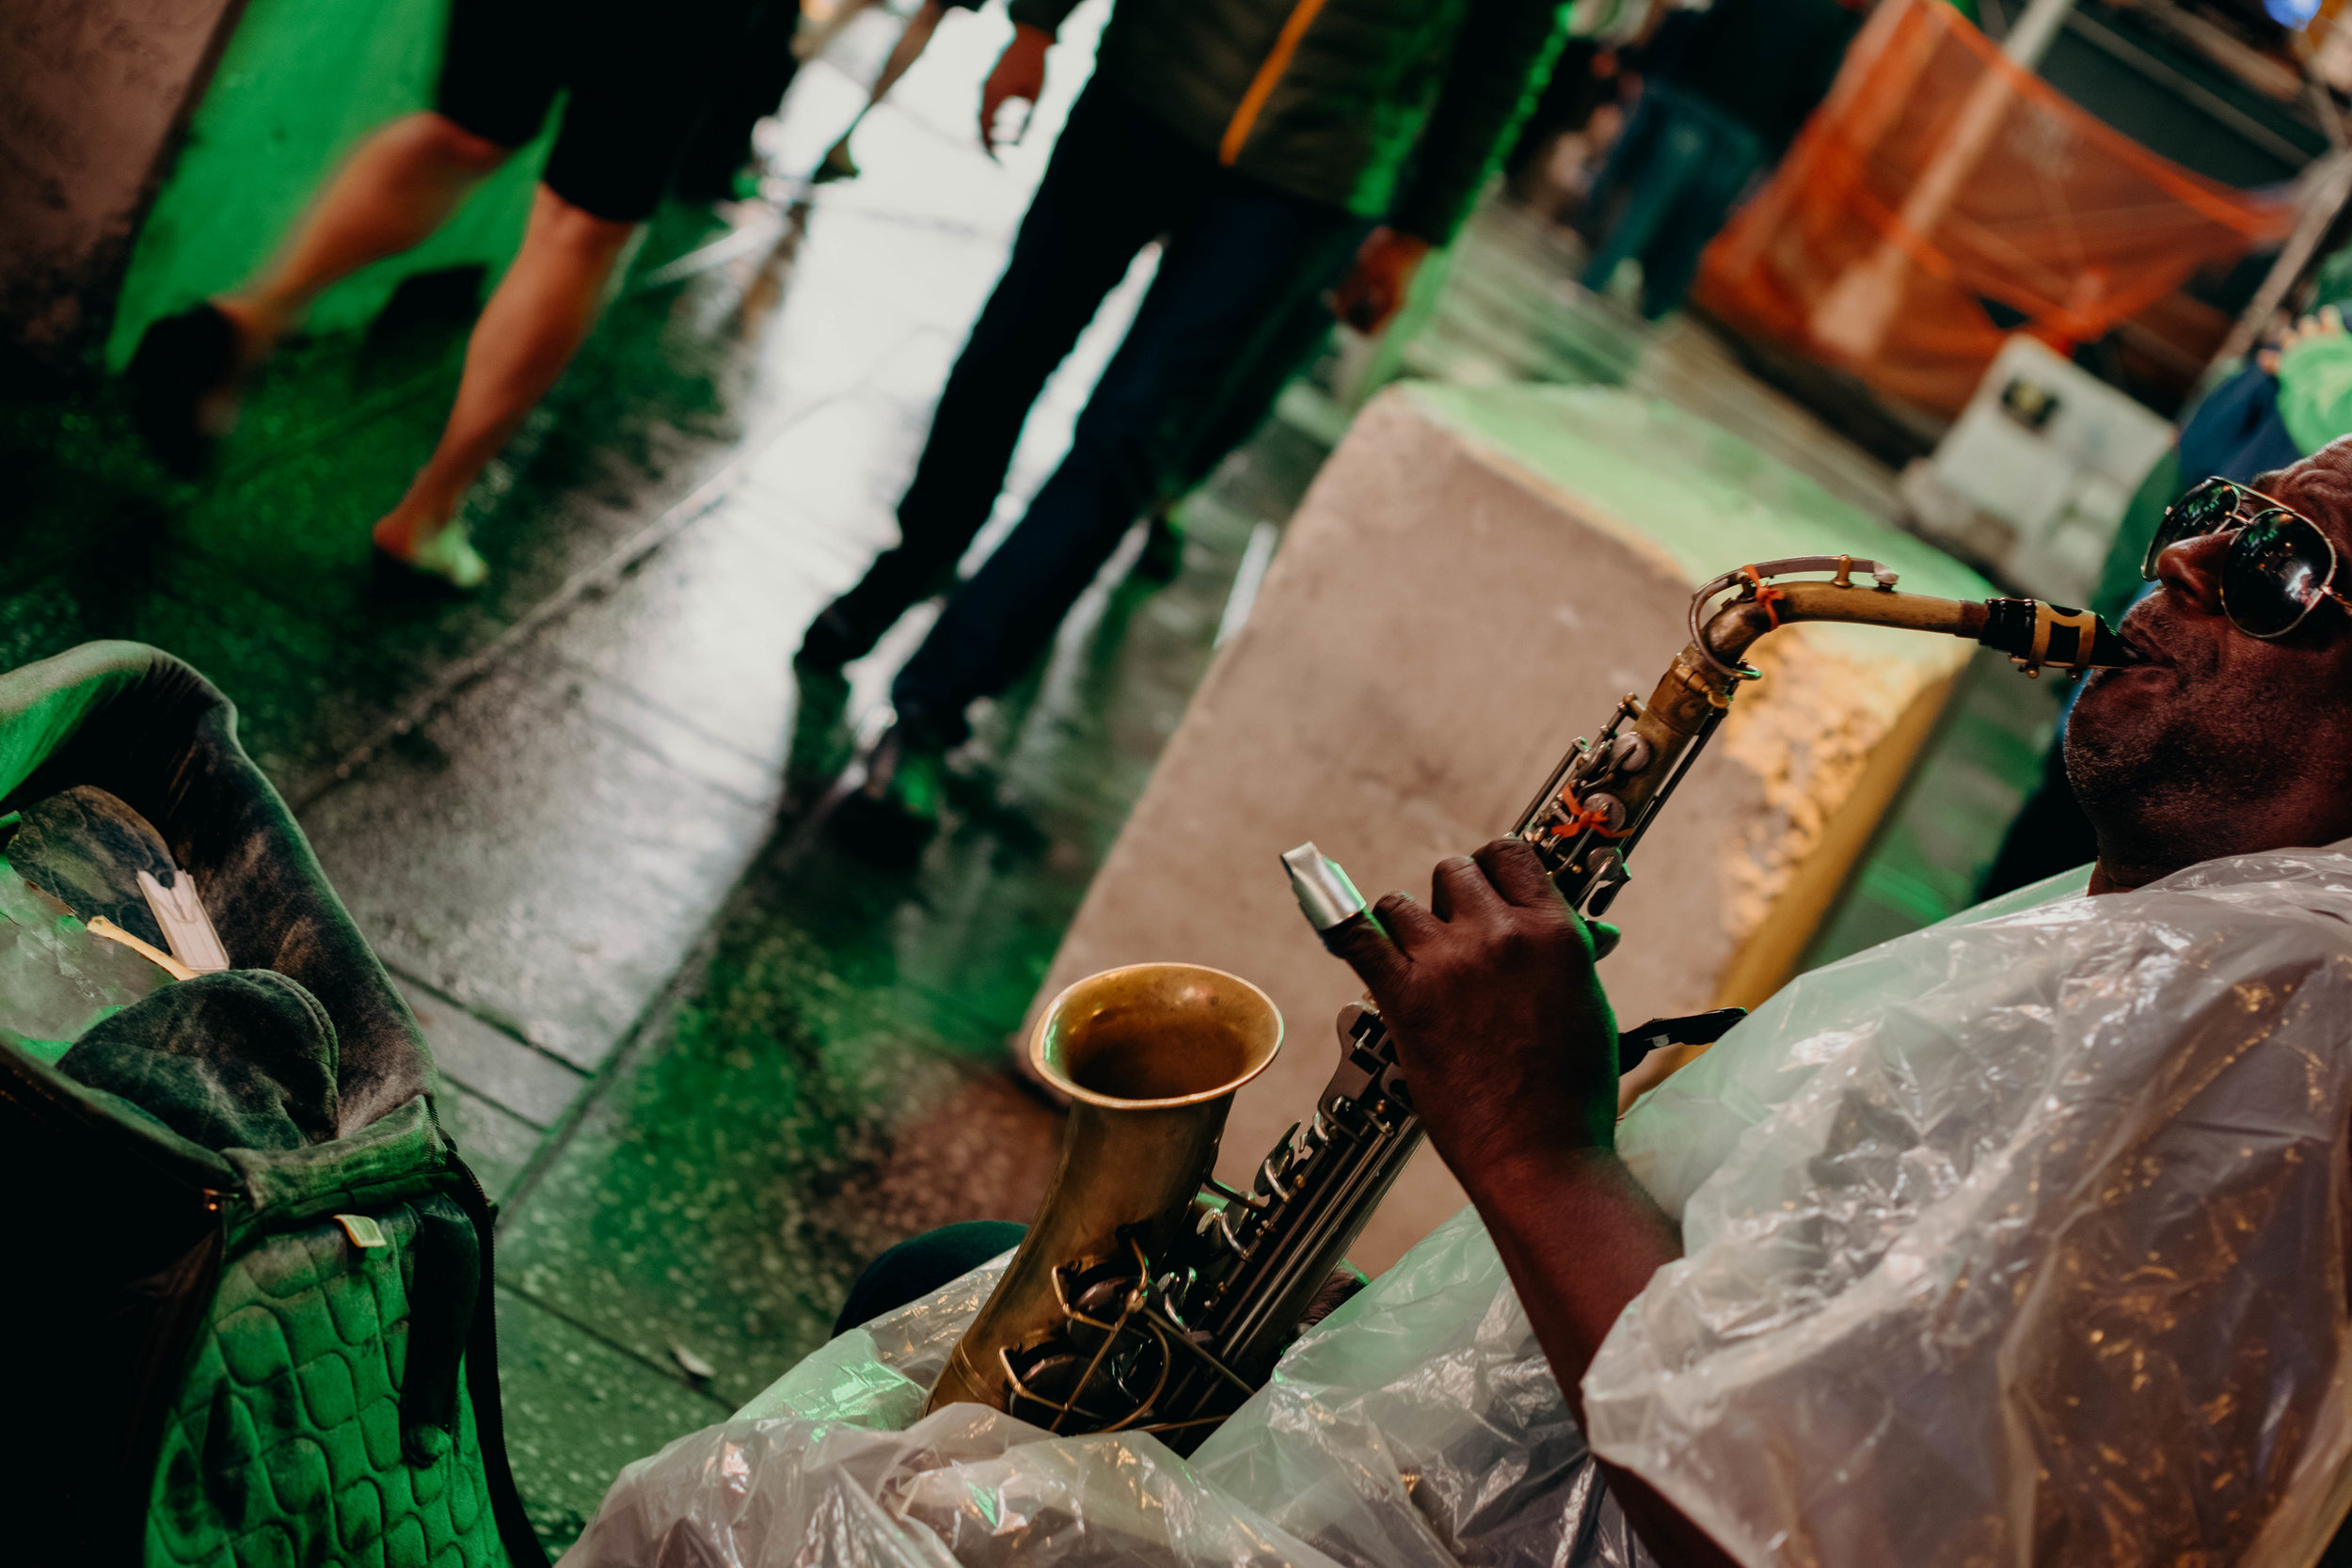 street_performer_saxaphone_jazz.jpg